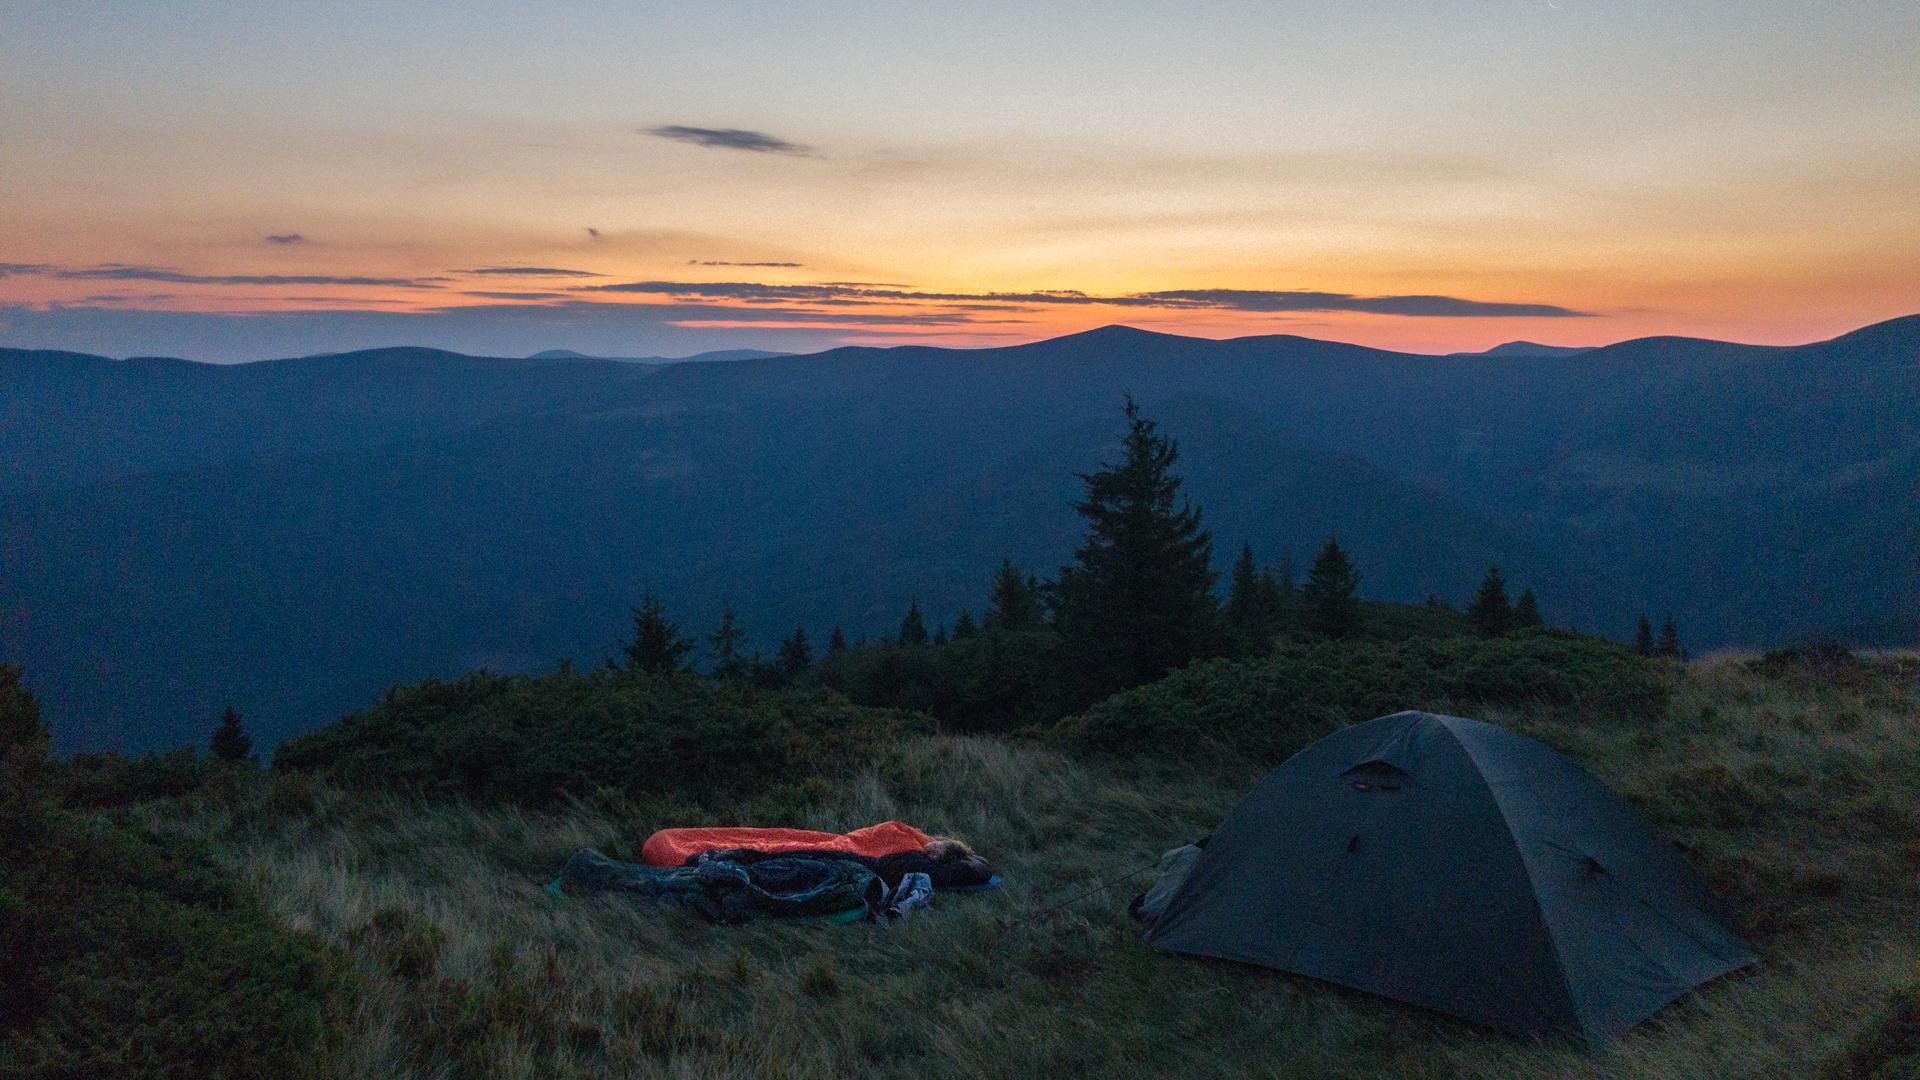 svidovec sunrise, ridge svidovec, camping at svidovec, tent svidovec